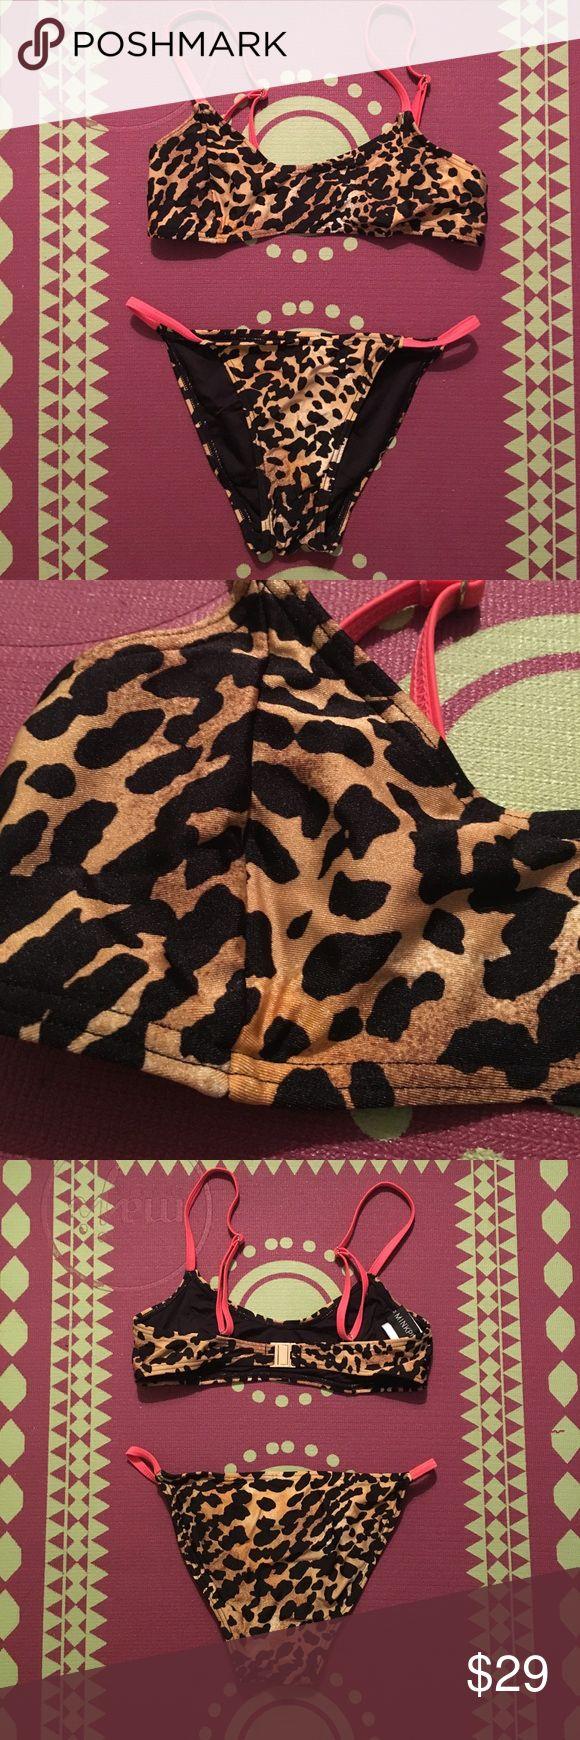 Minkpink Bikini Leopard print Minkpink bikini. Super cute and sassy. Top and bottom included. Size XS and true to size. Very gently worn, almost like new. No fading. MINKPINK Swim Bikinis